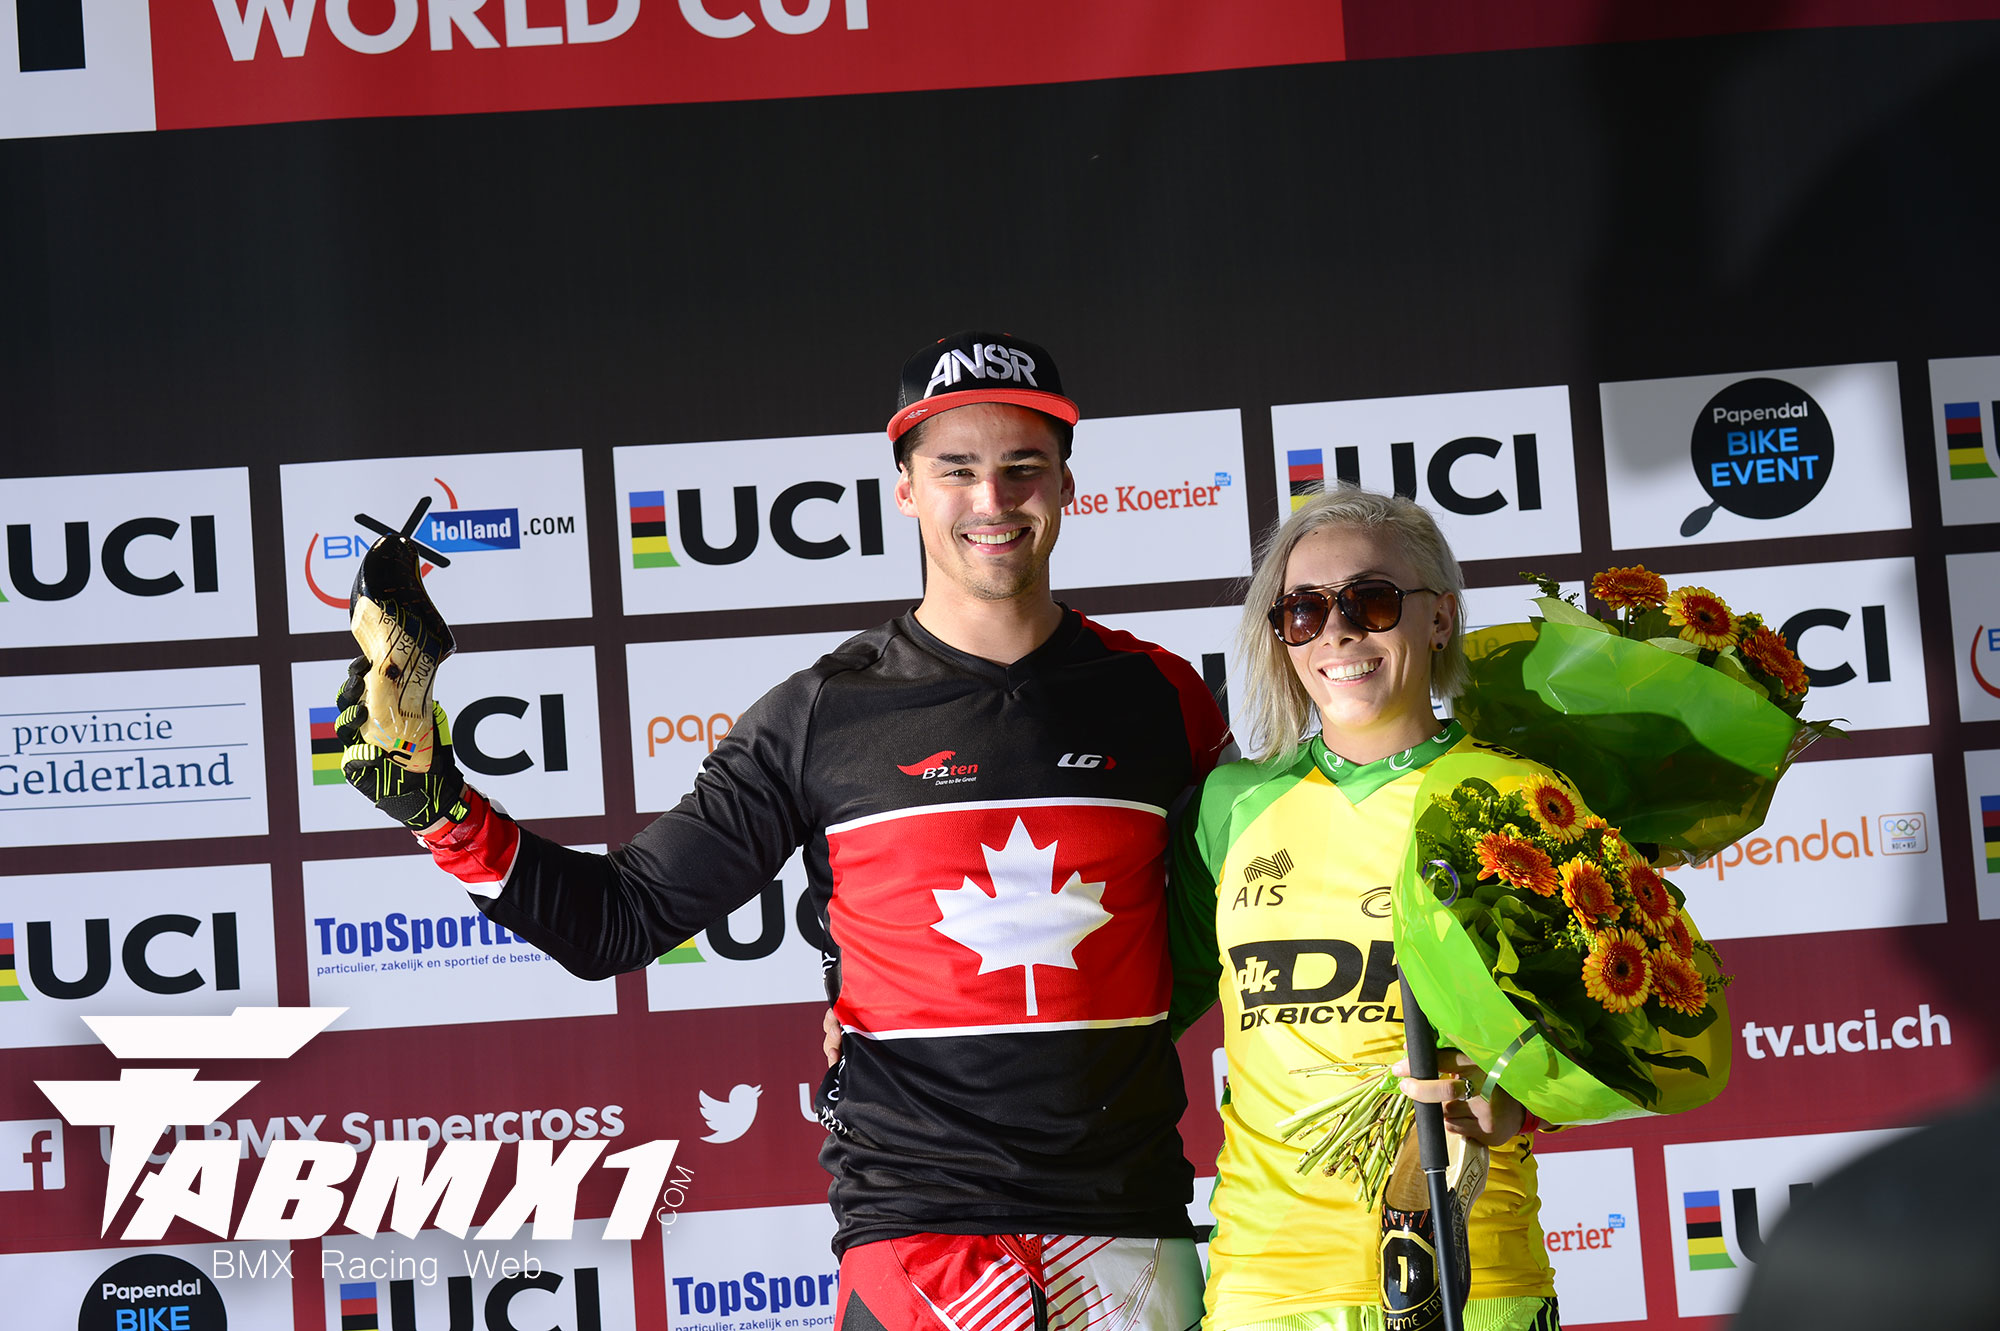 UCI SX RD 3 TT, Nyhaug et Buchanan s'imposent